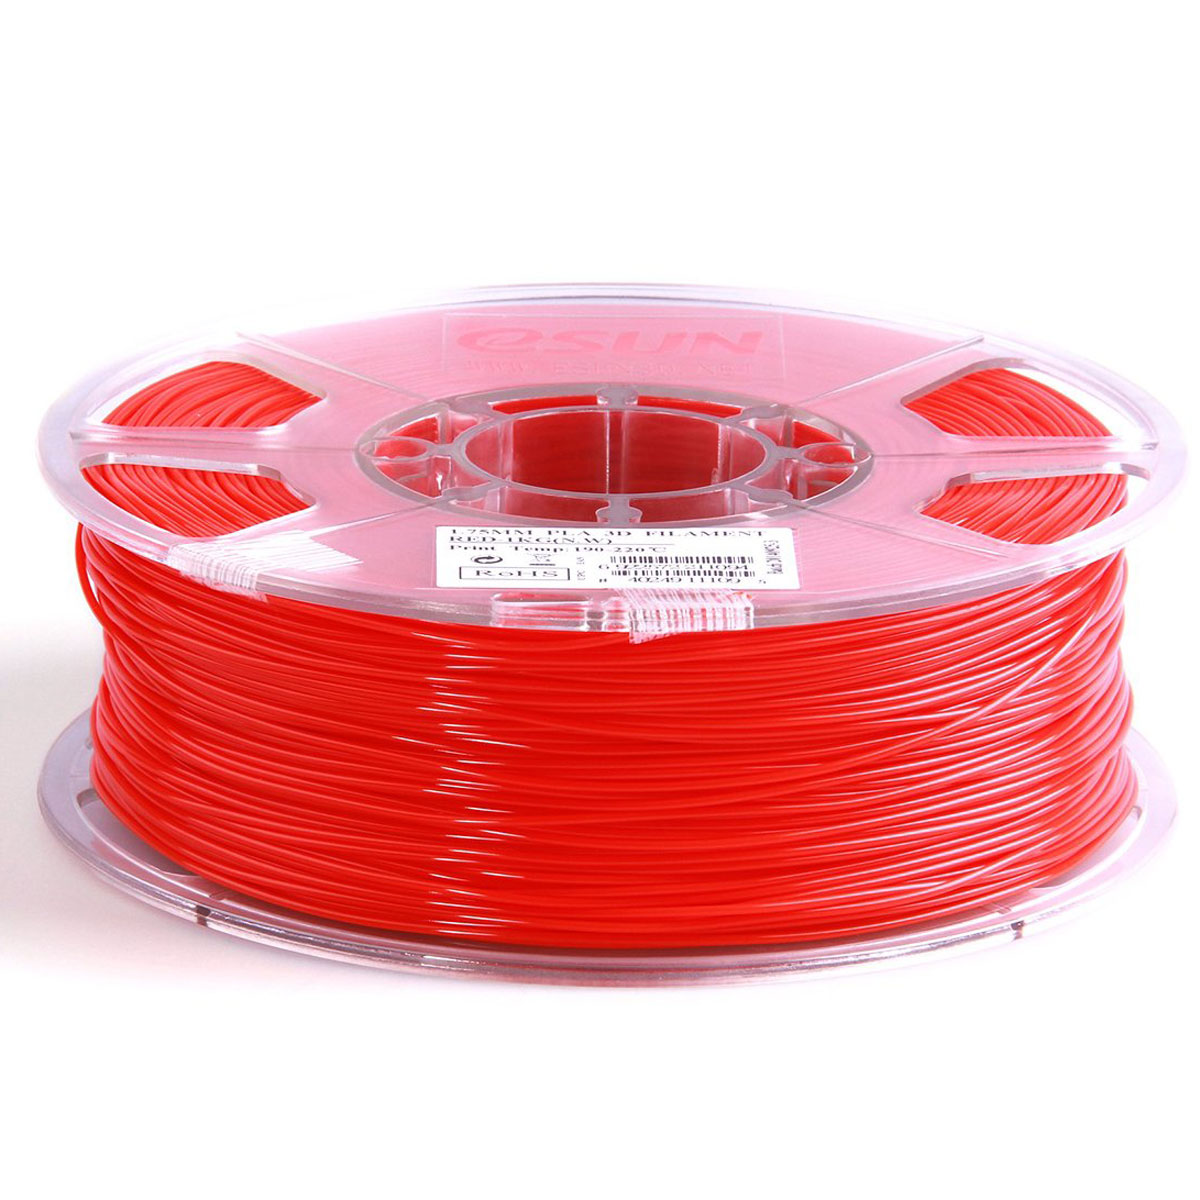 ESUN пластик PLA в катушке, Red, 1,75 мм - Расходные материалы